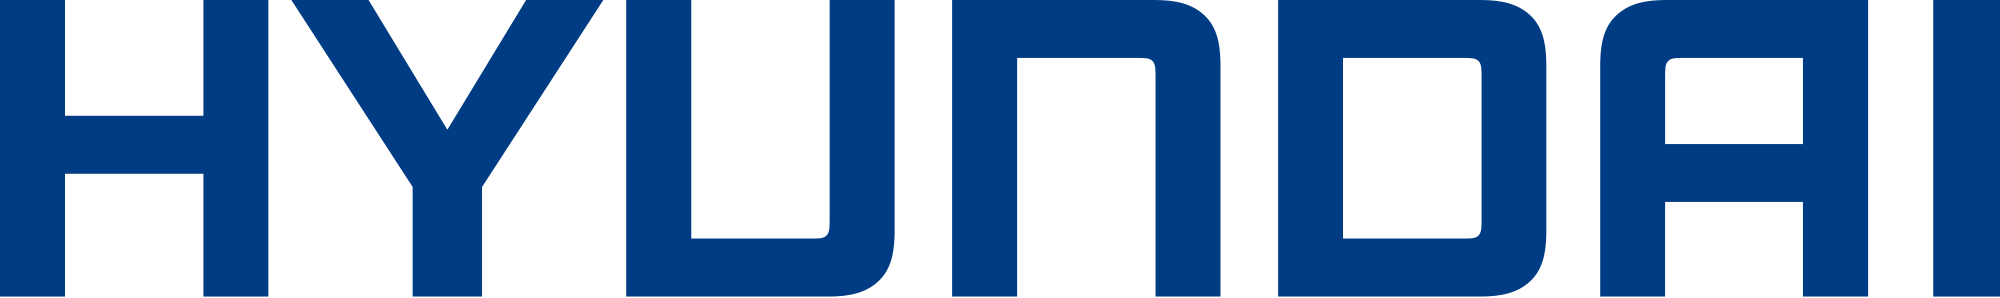 Hyundai Logo PNG - 30376